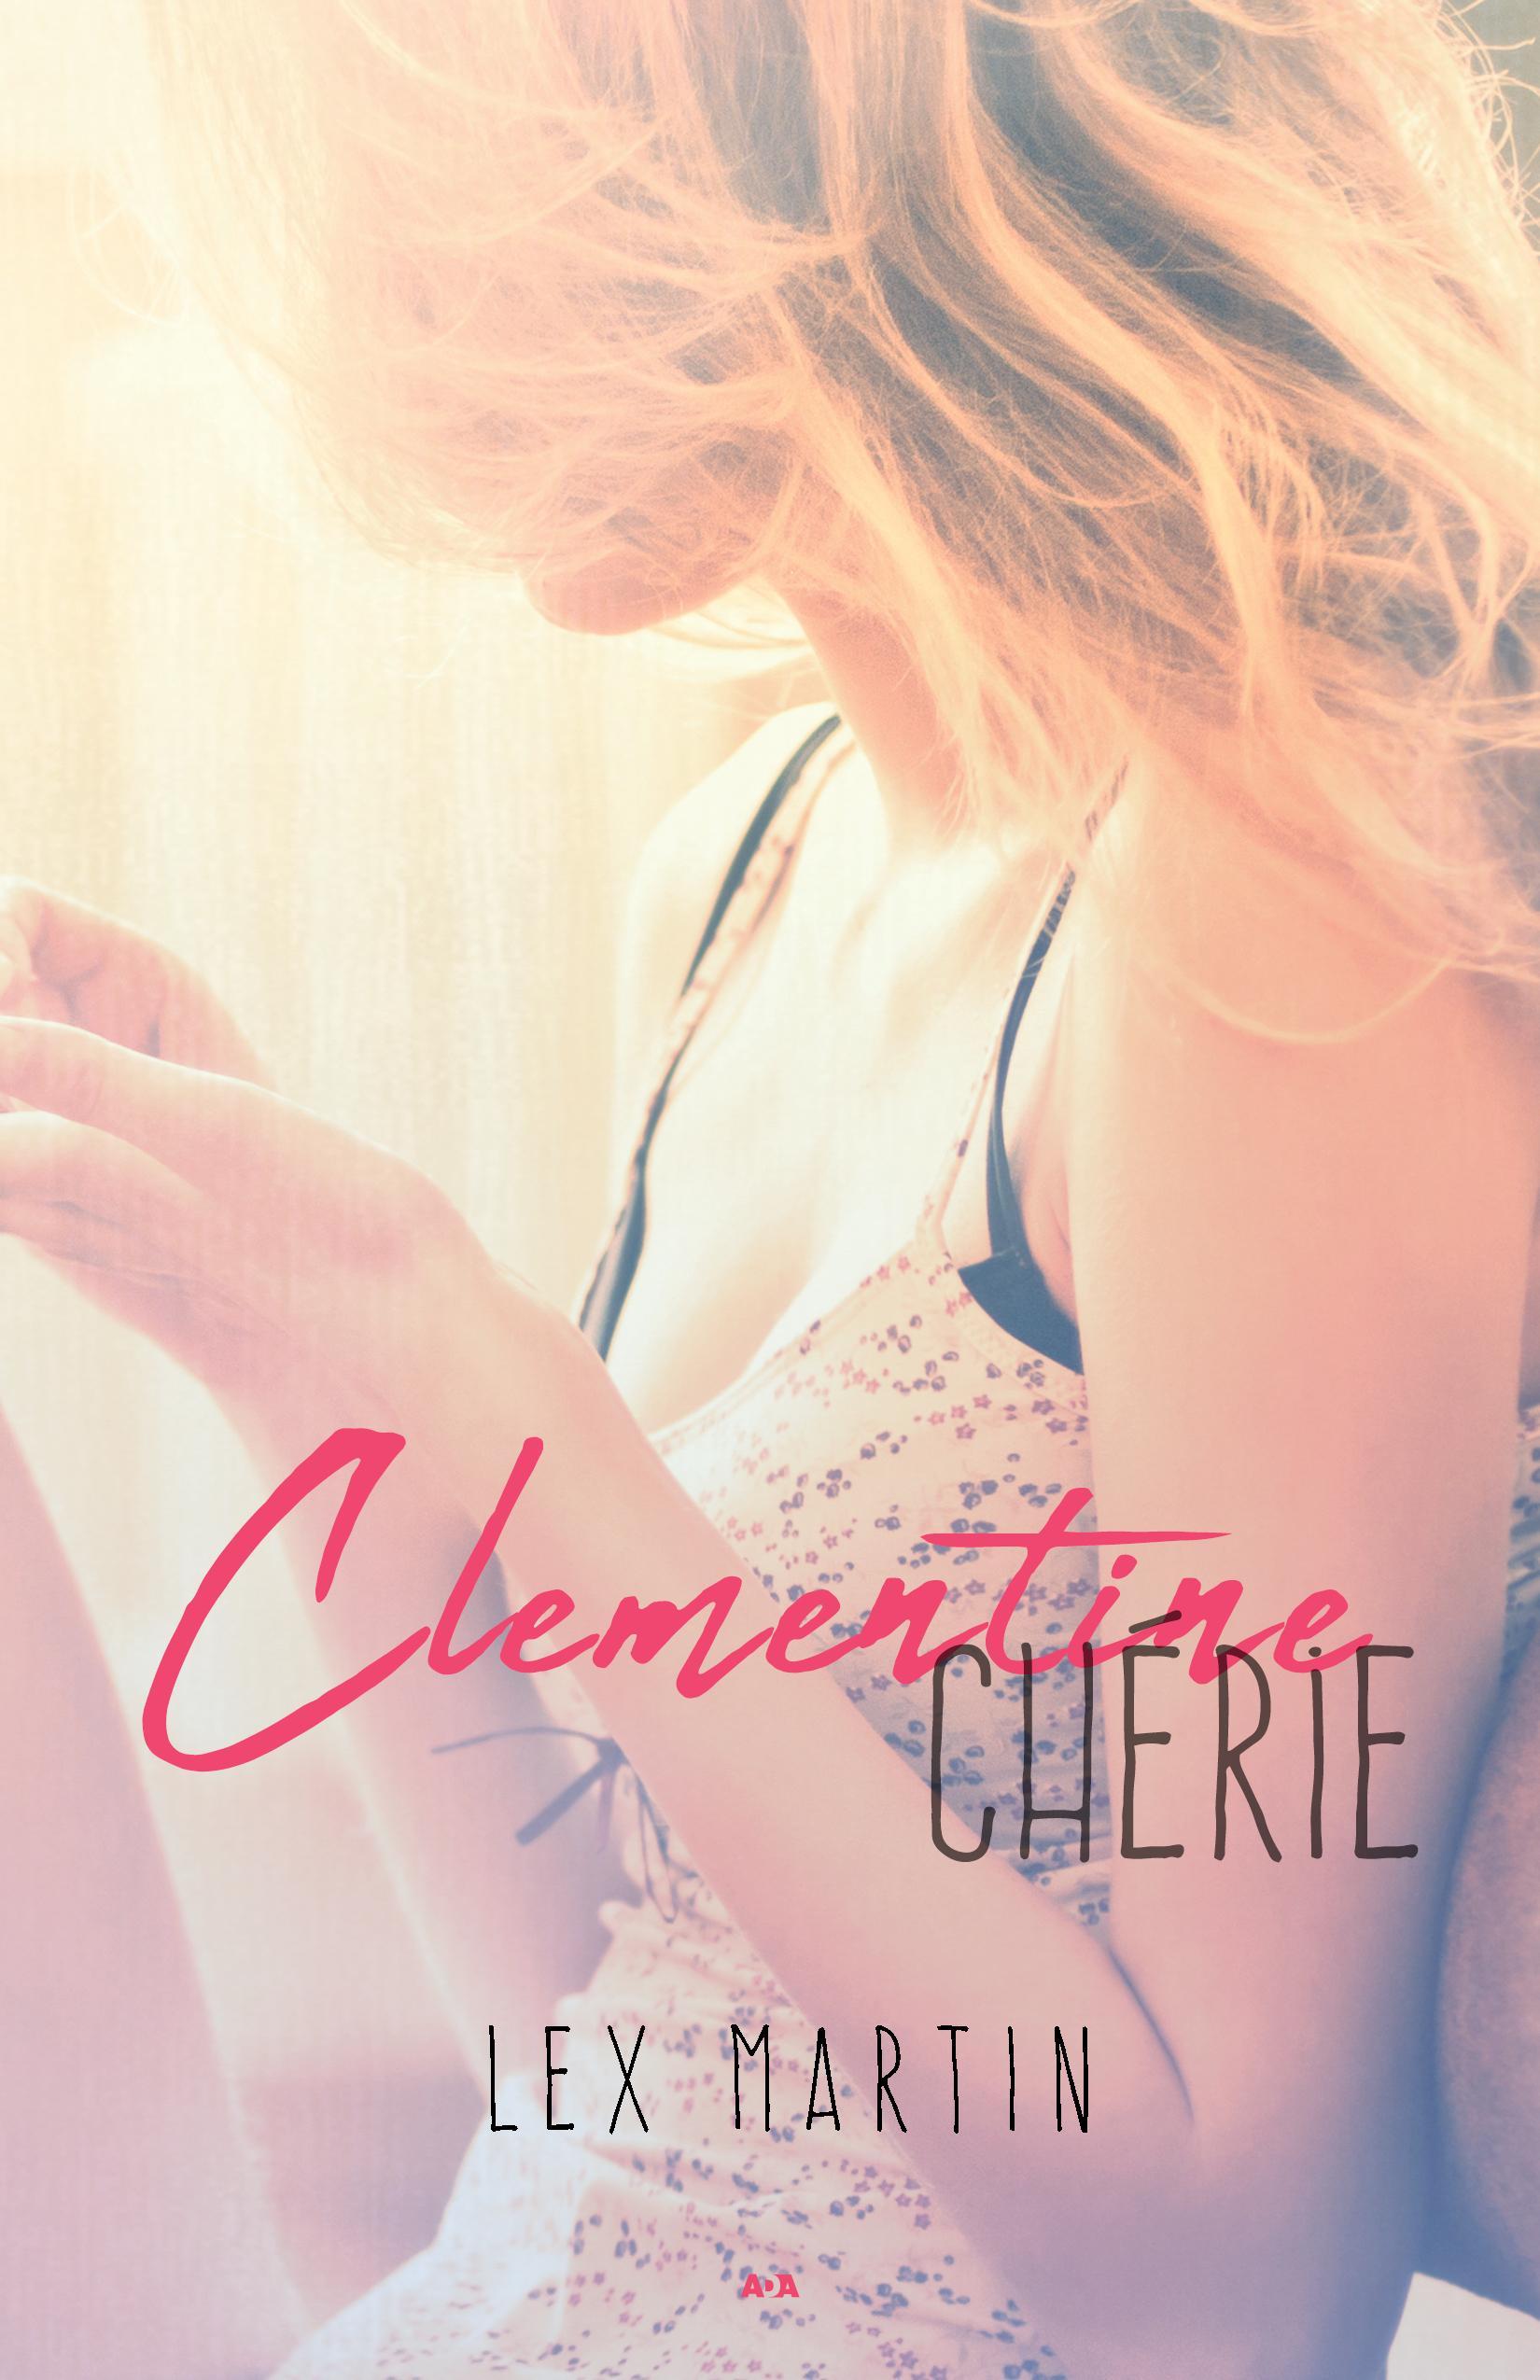 Clementine chérie